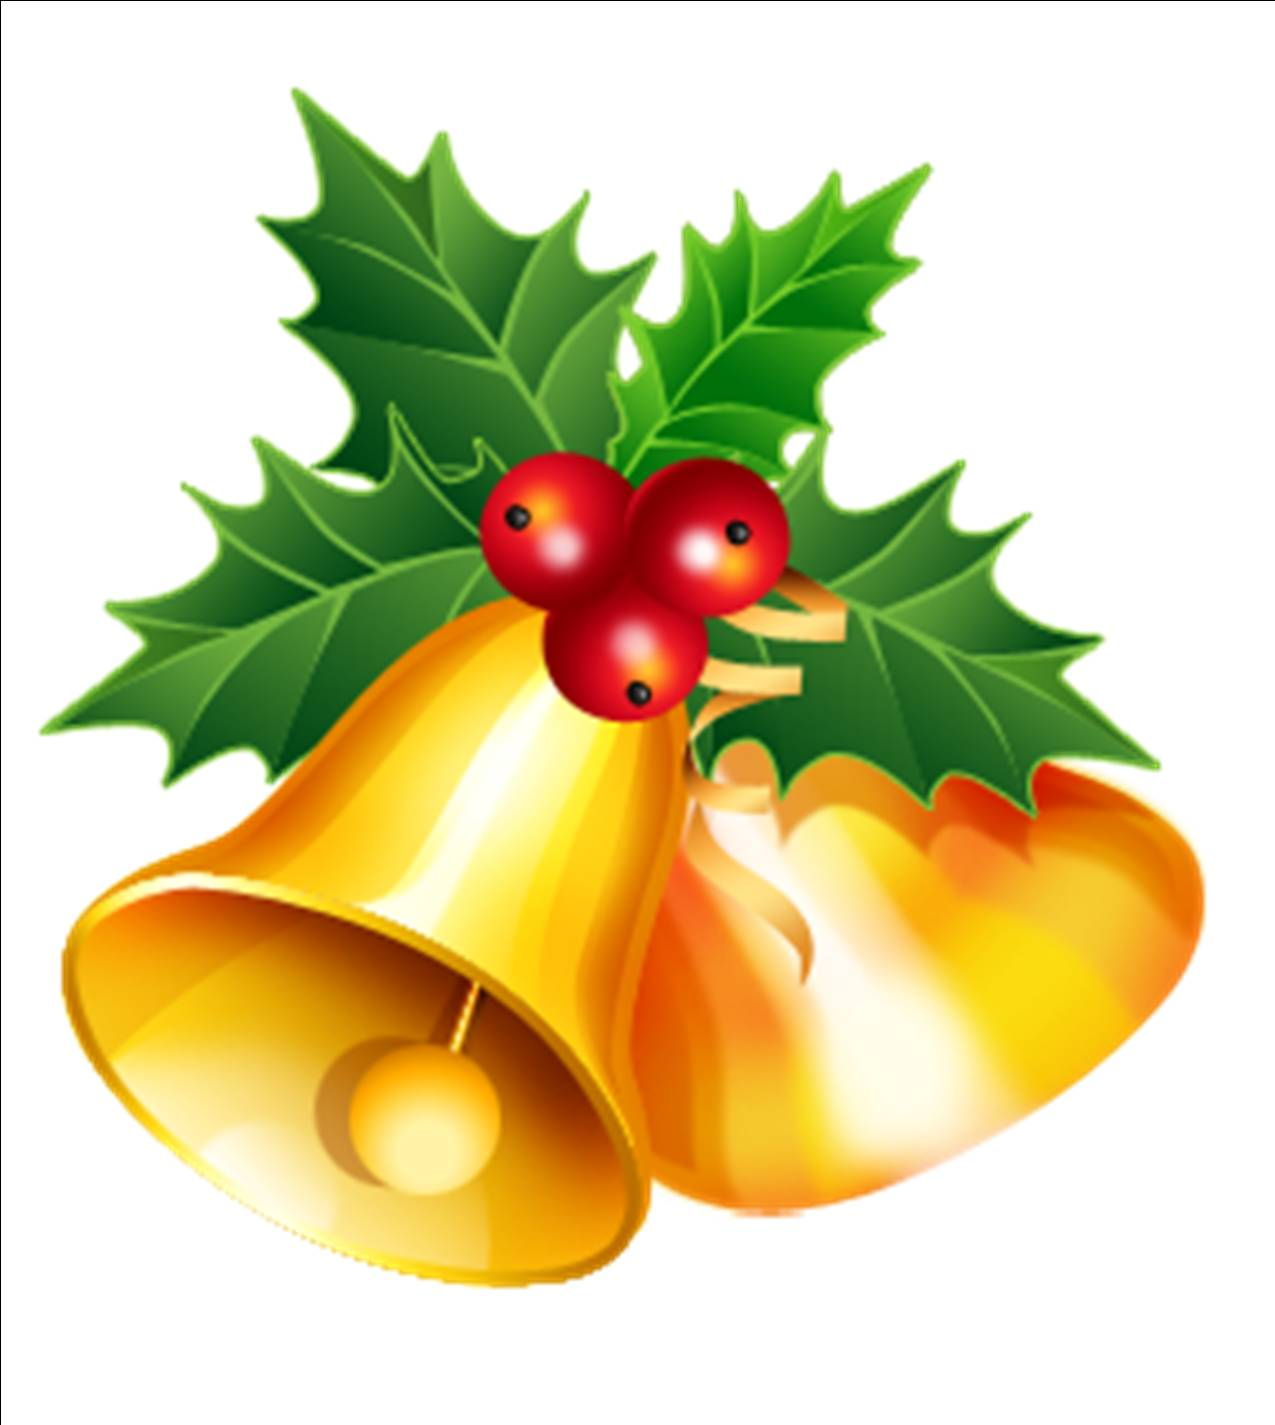 Christmas bell clipart #16